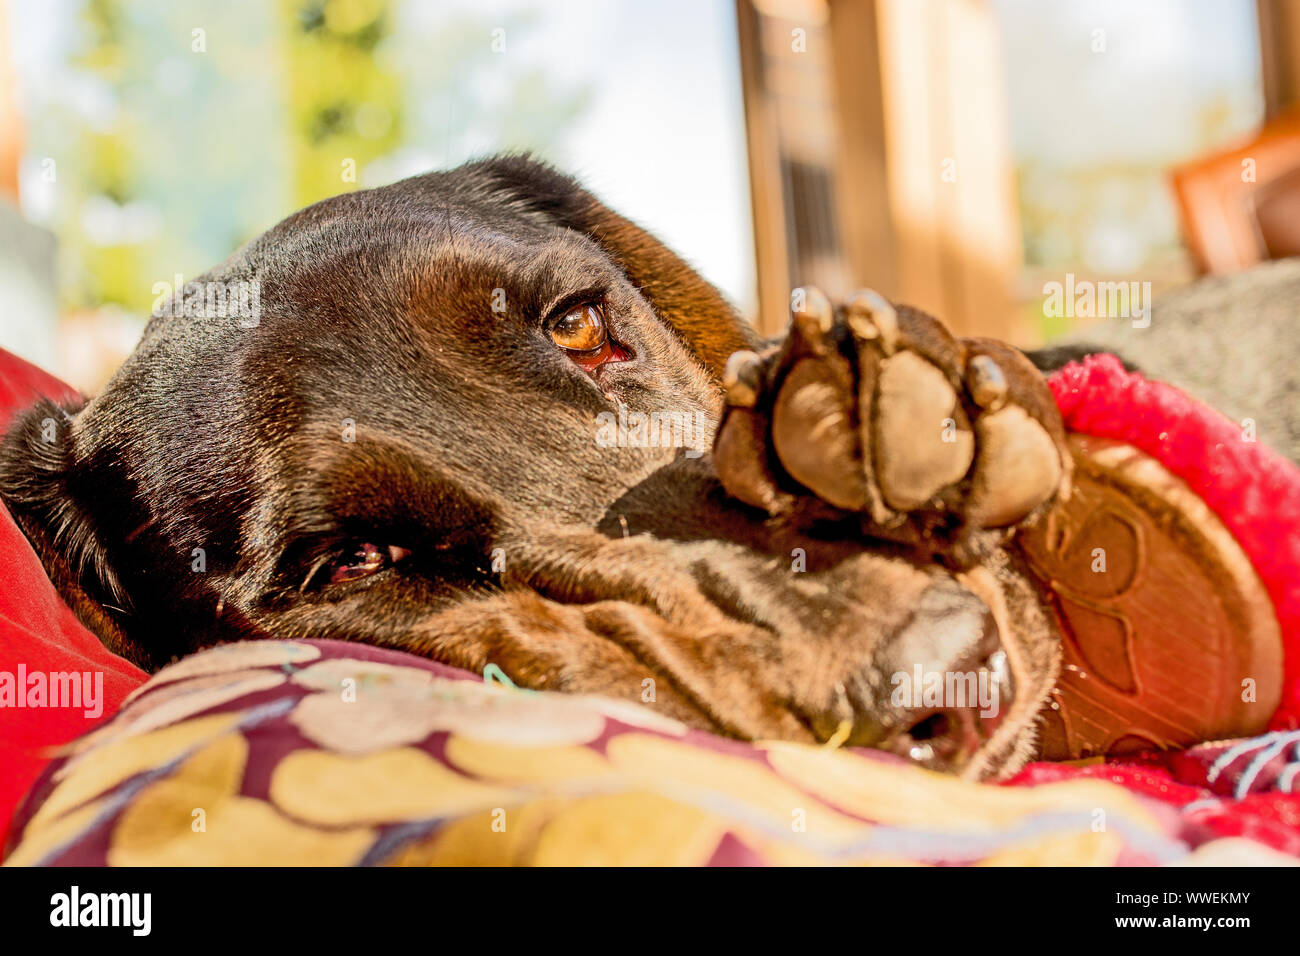 Sad dog's face in the morning sunlight Stock Photo